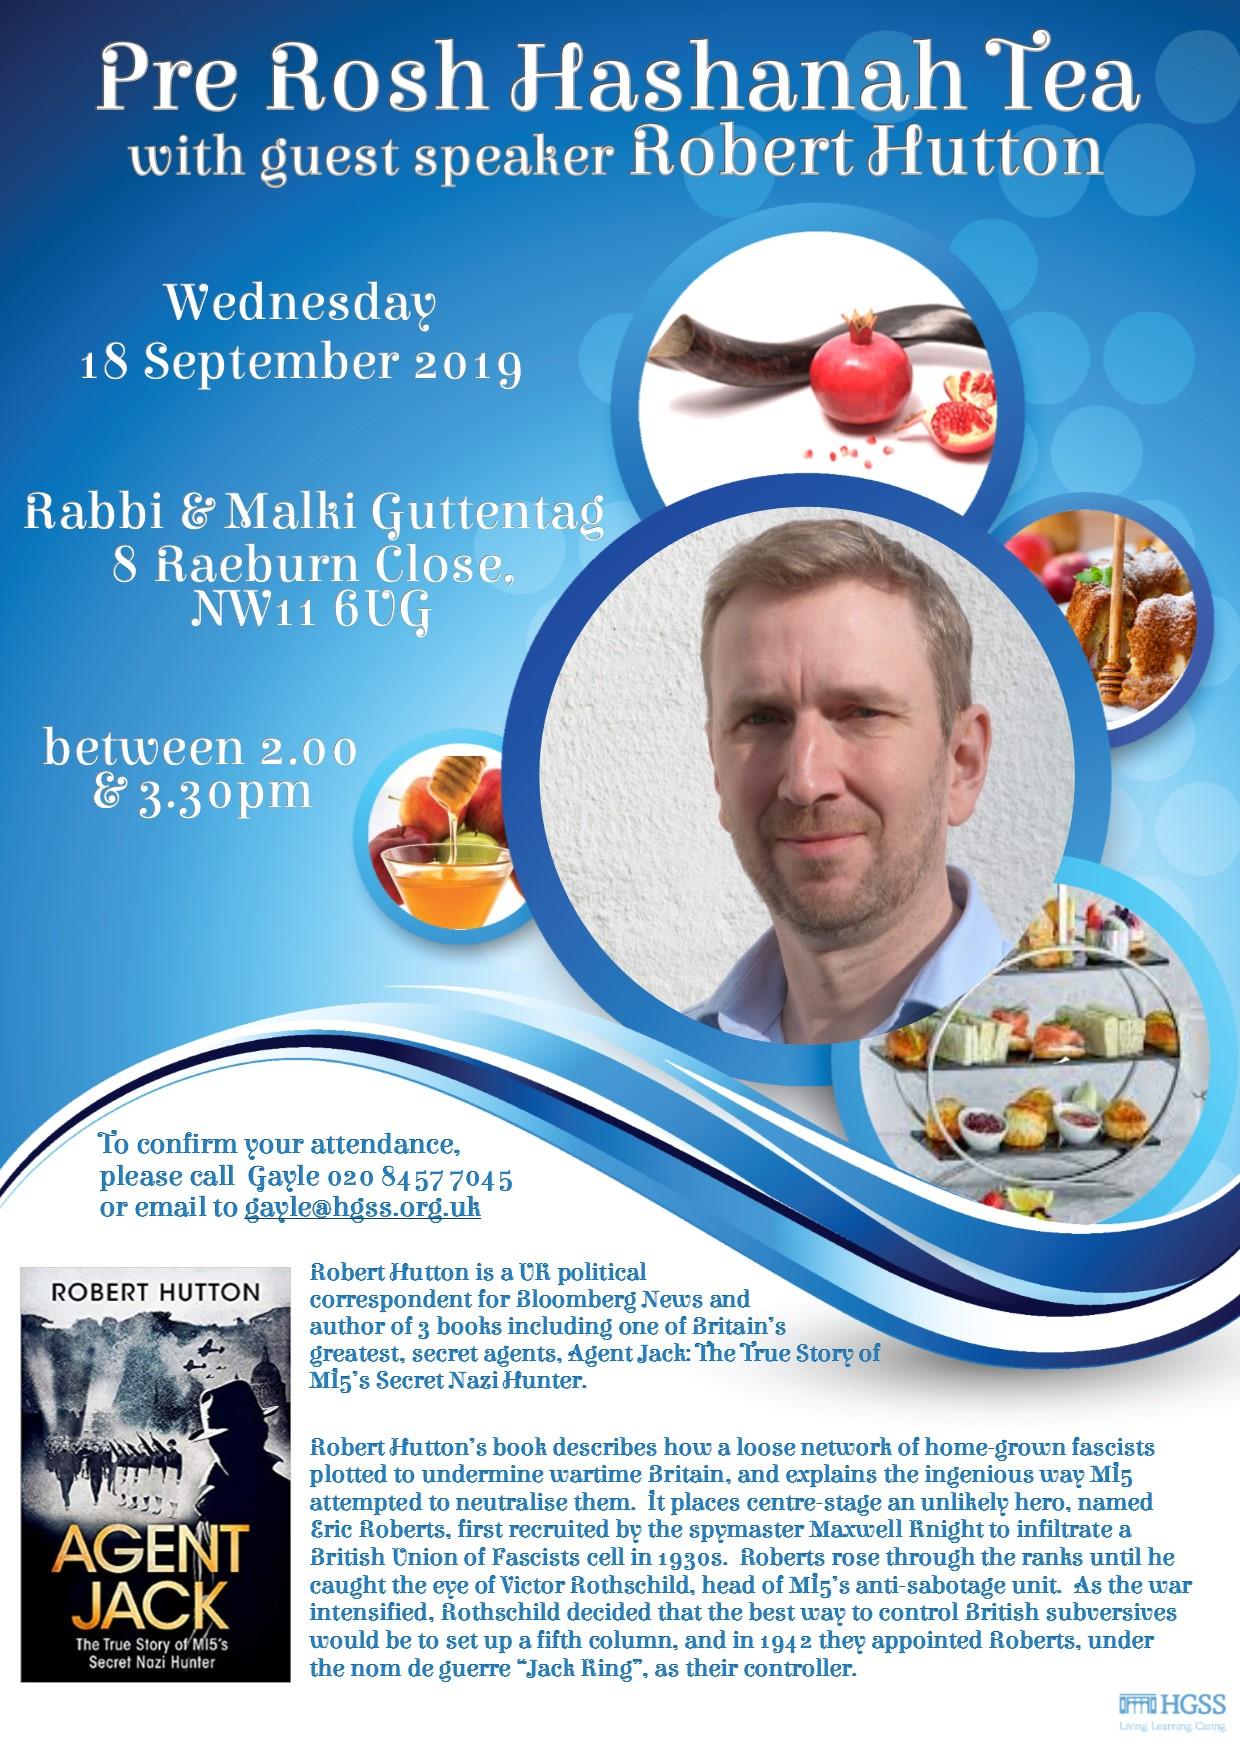 Pre Rosh Hashanah Tea @ 8 Raeburn Close, NW11 6UG